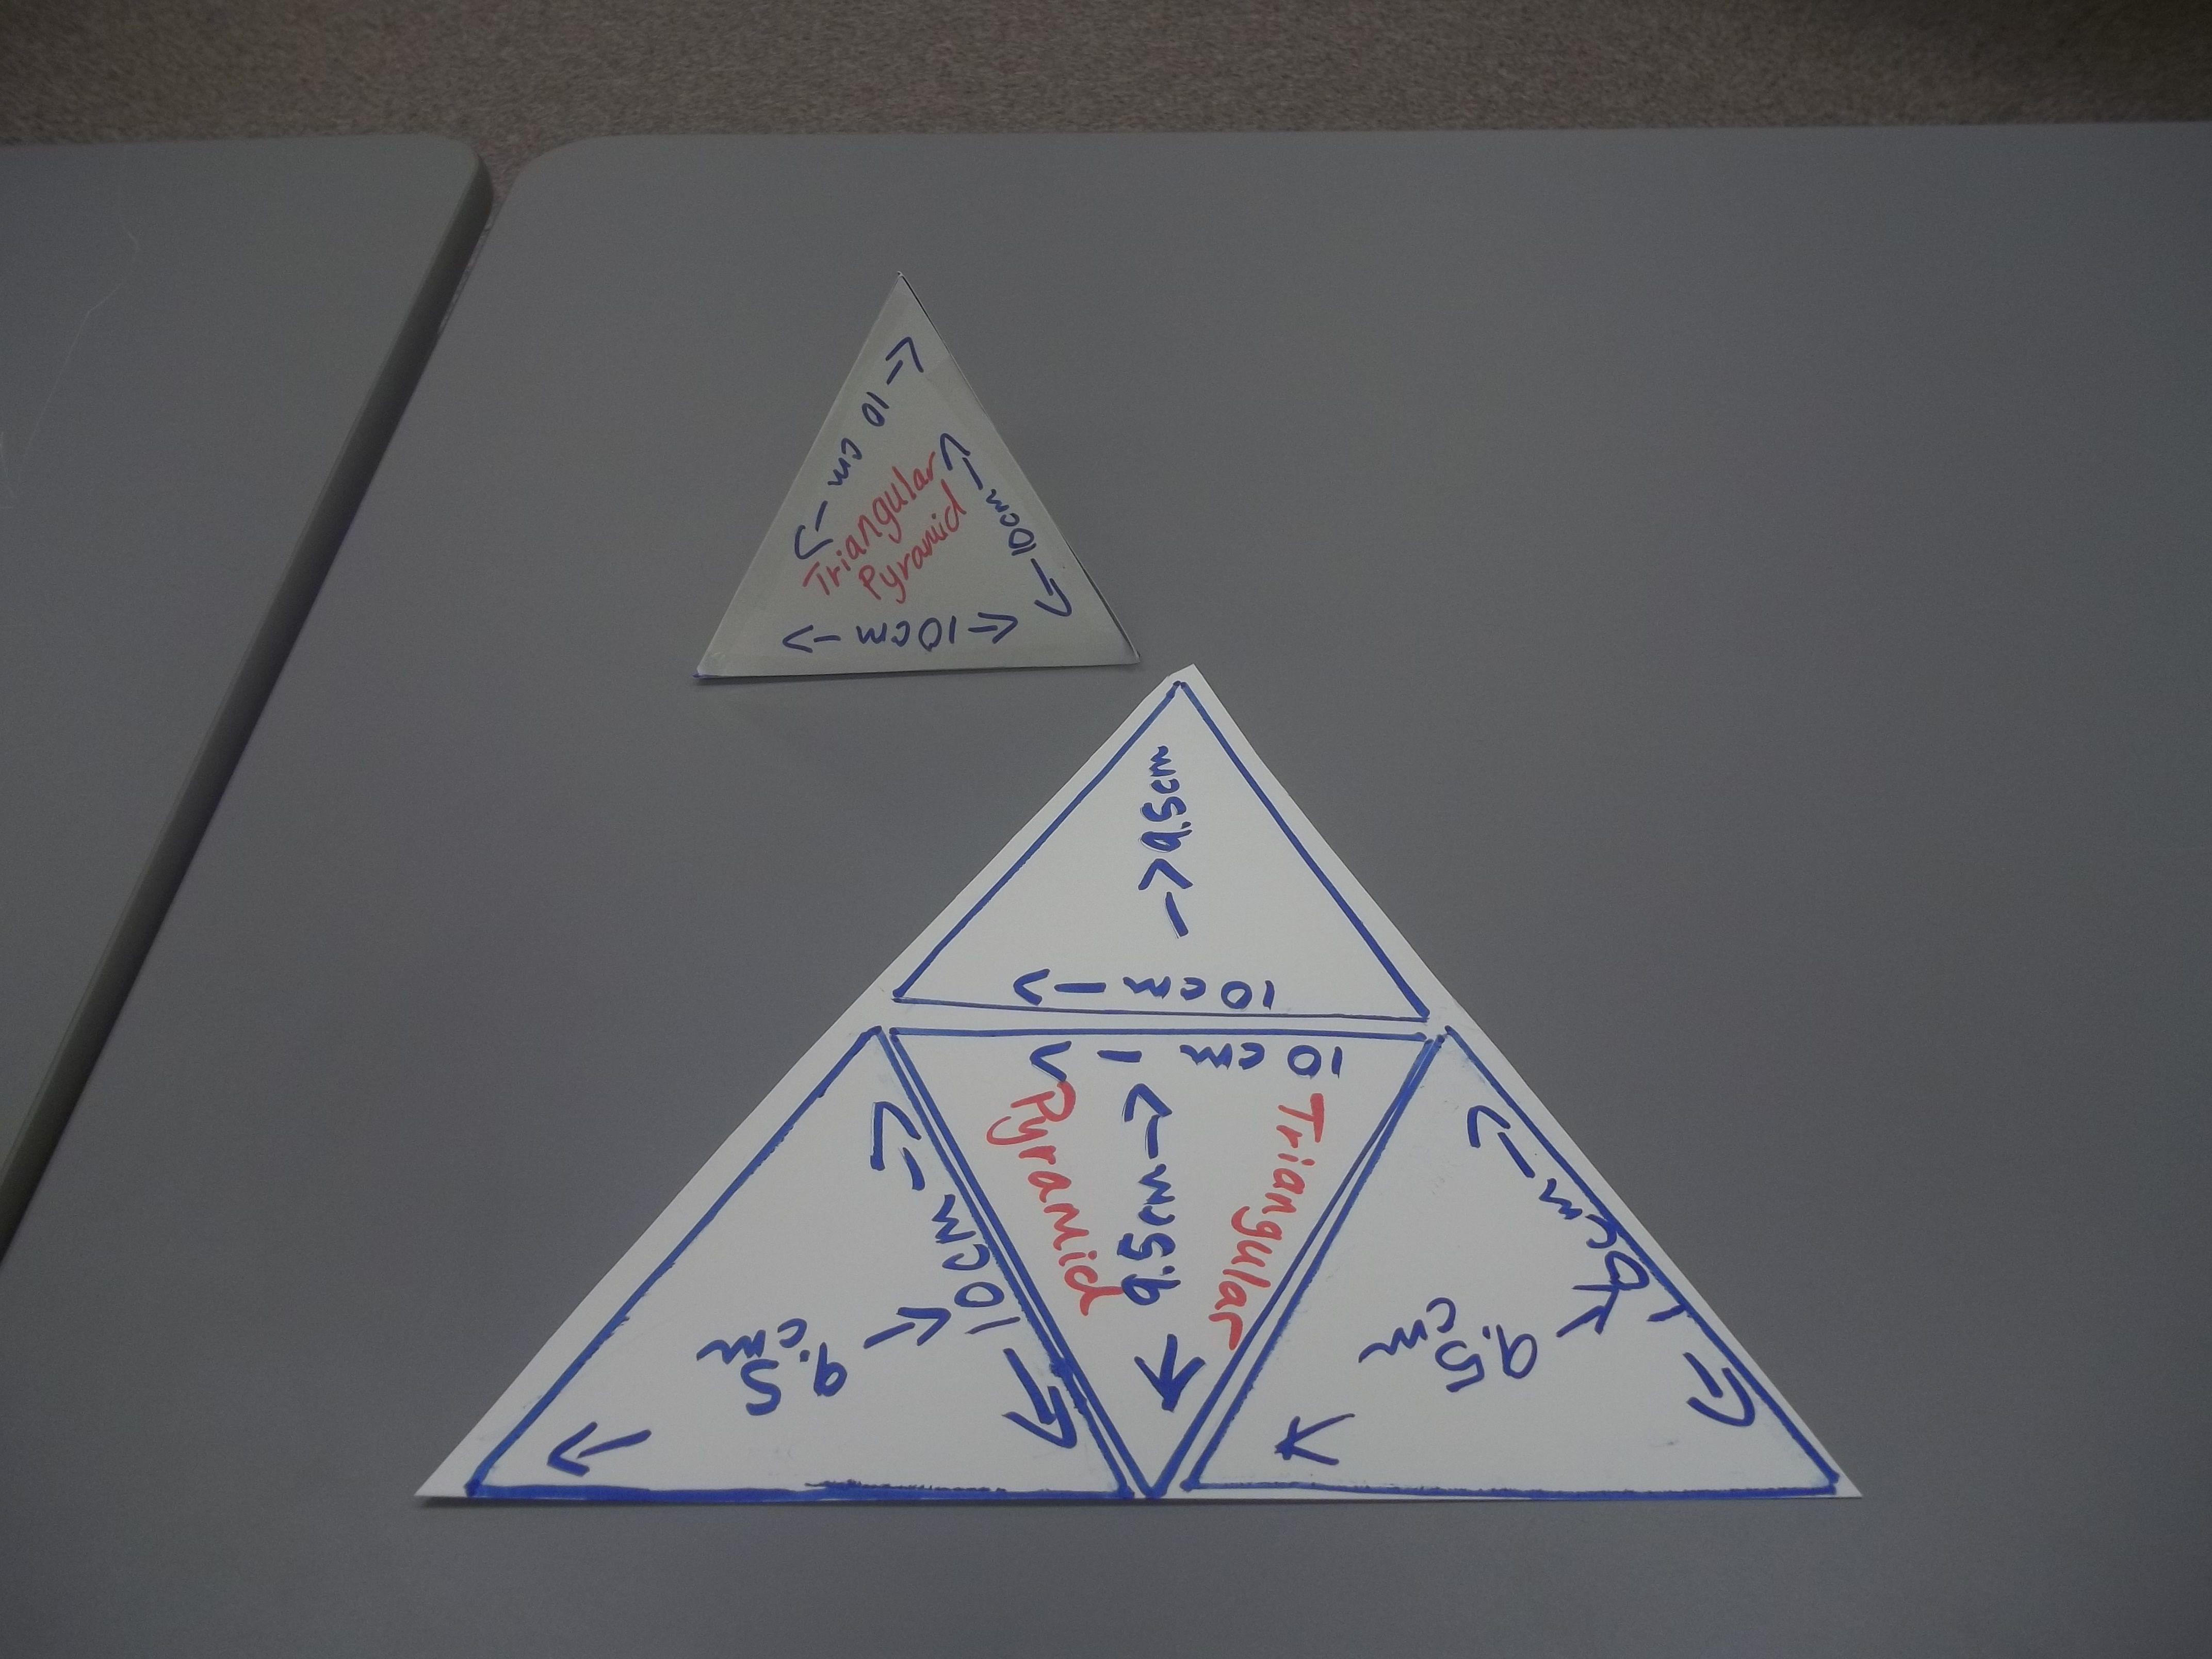 Surface Area Of Triangular Pyramid Using Net